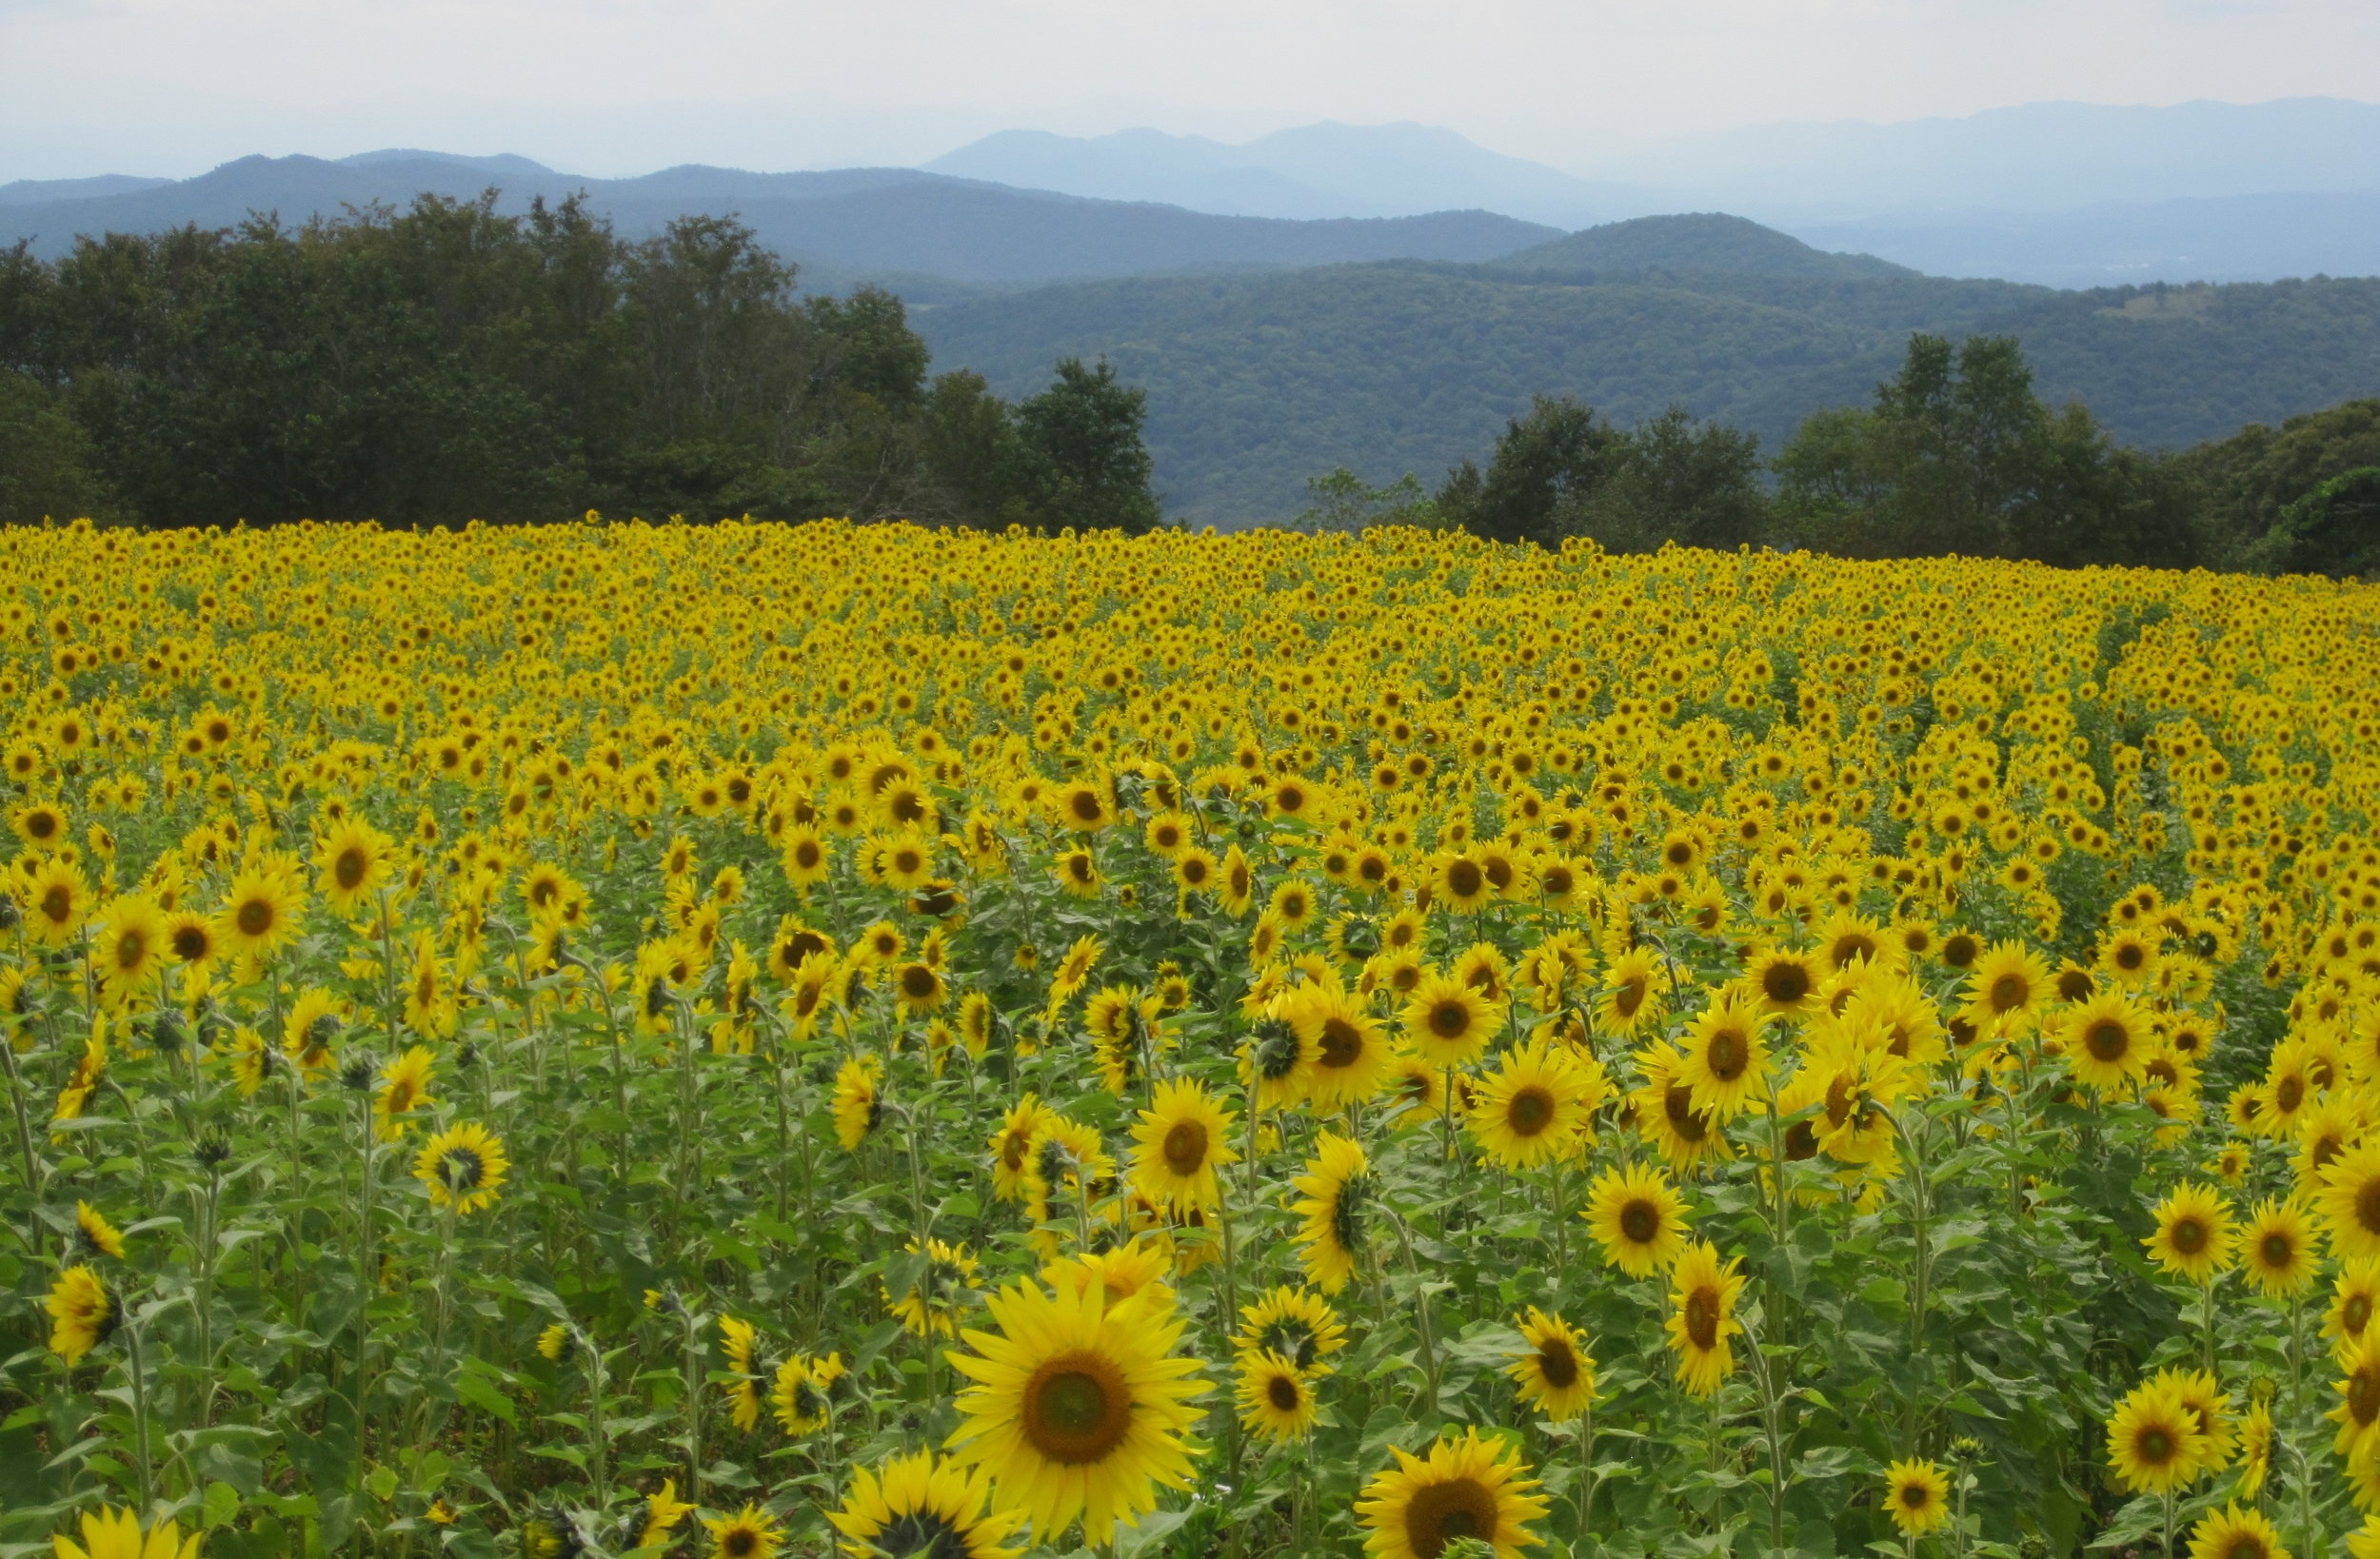 sunflowers+on+pond+mtn.jpg